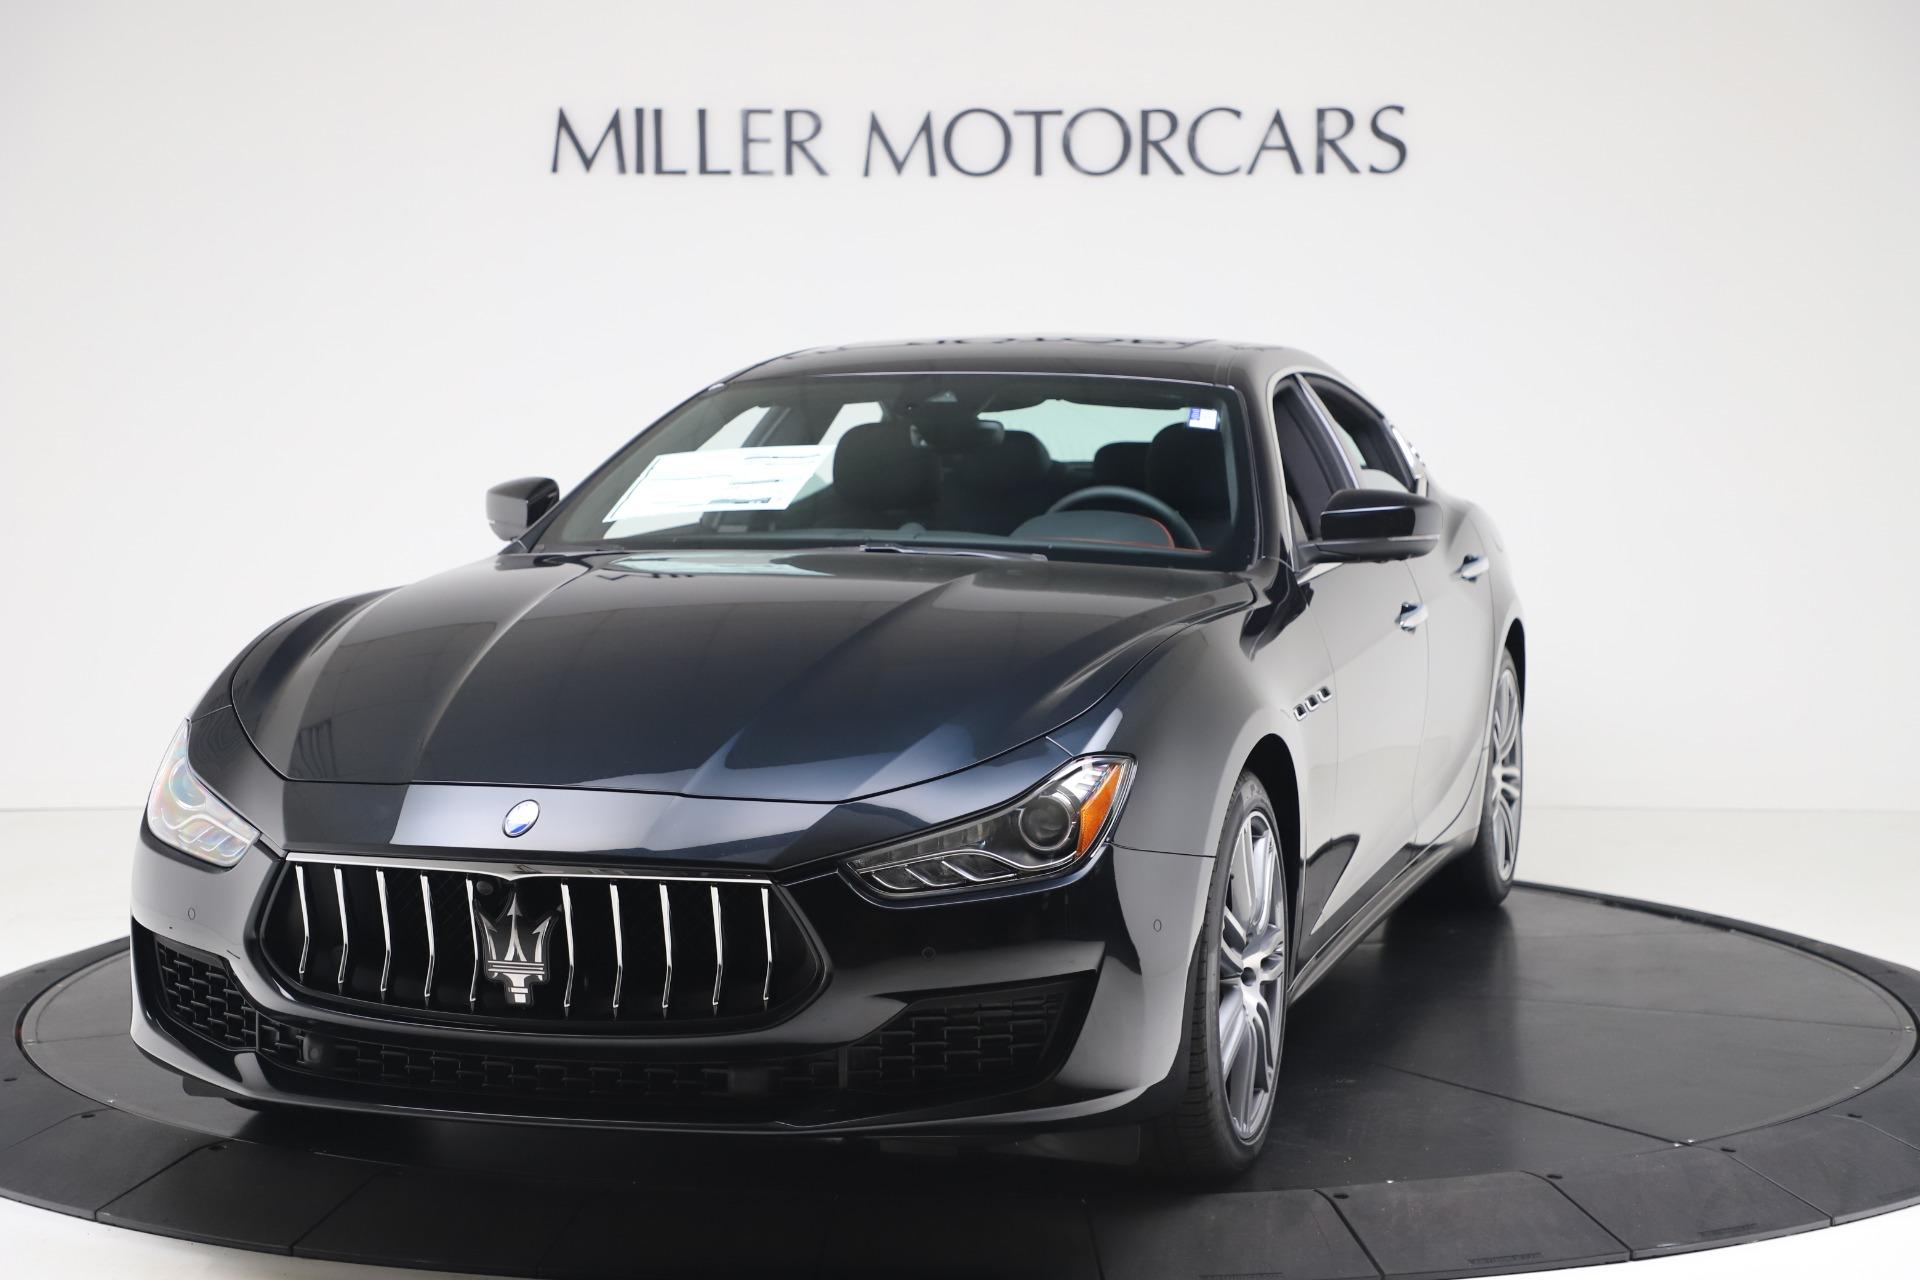 New 2020 Maserati Ghibli S Q4 for sale $87,285 at Pagani of Greenwich in Greenwich CT 06830 1